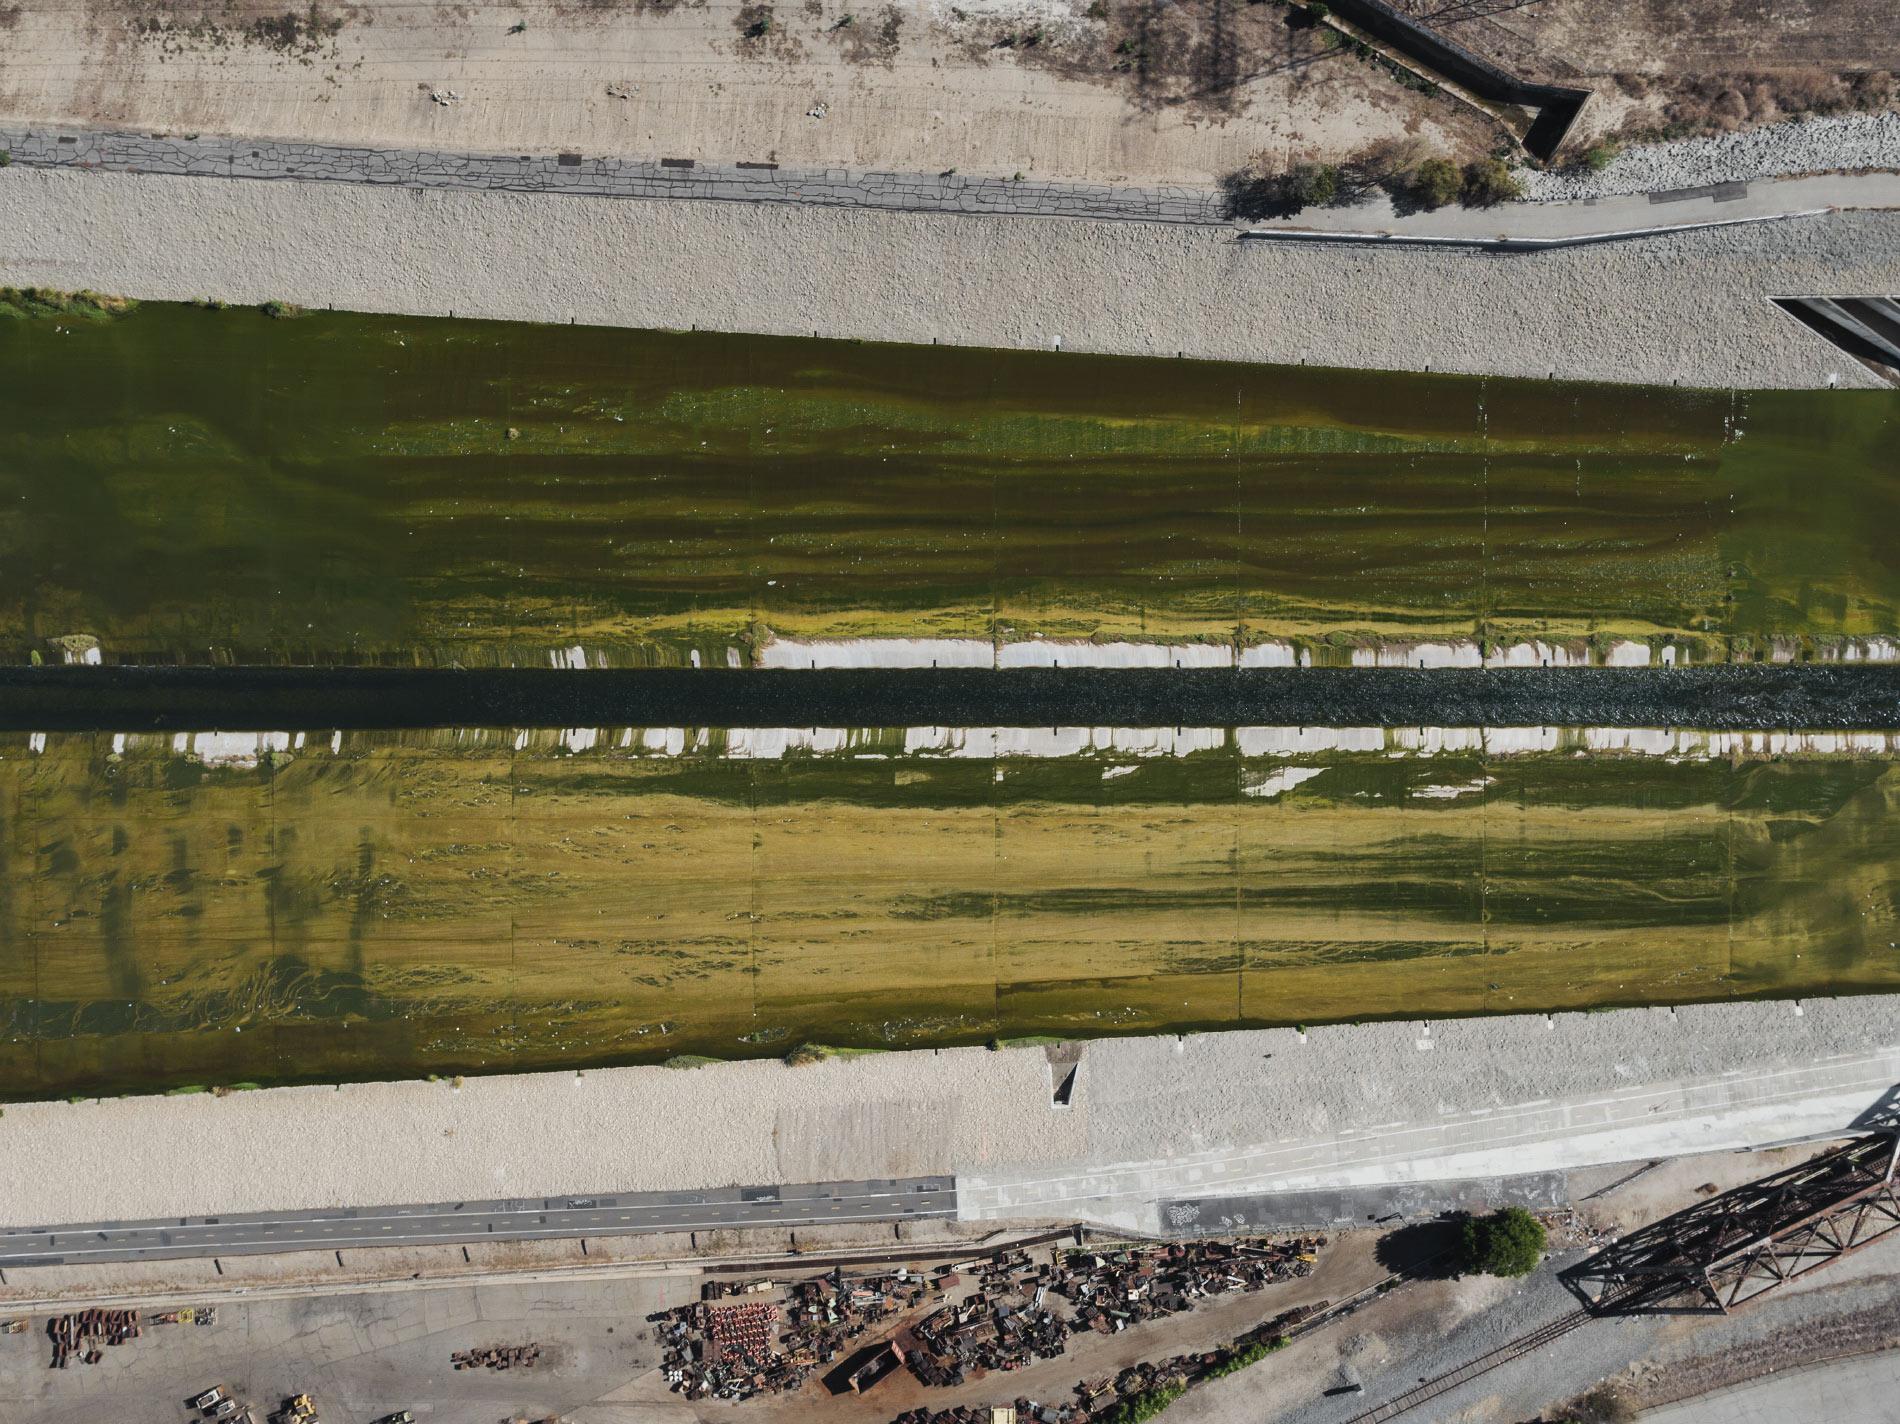 LA_River_drone_151202_03.jpg